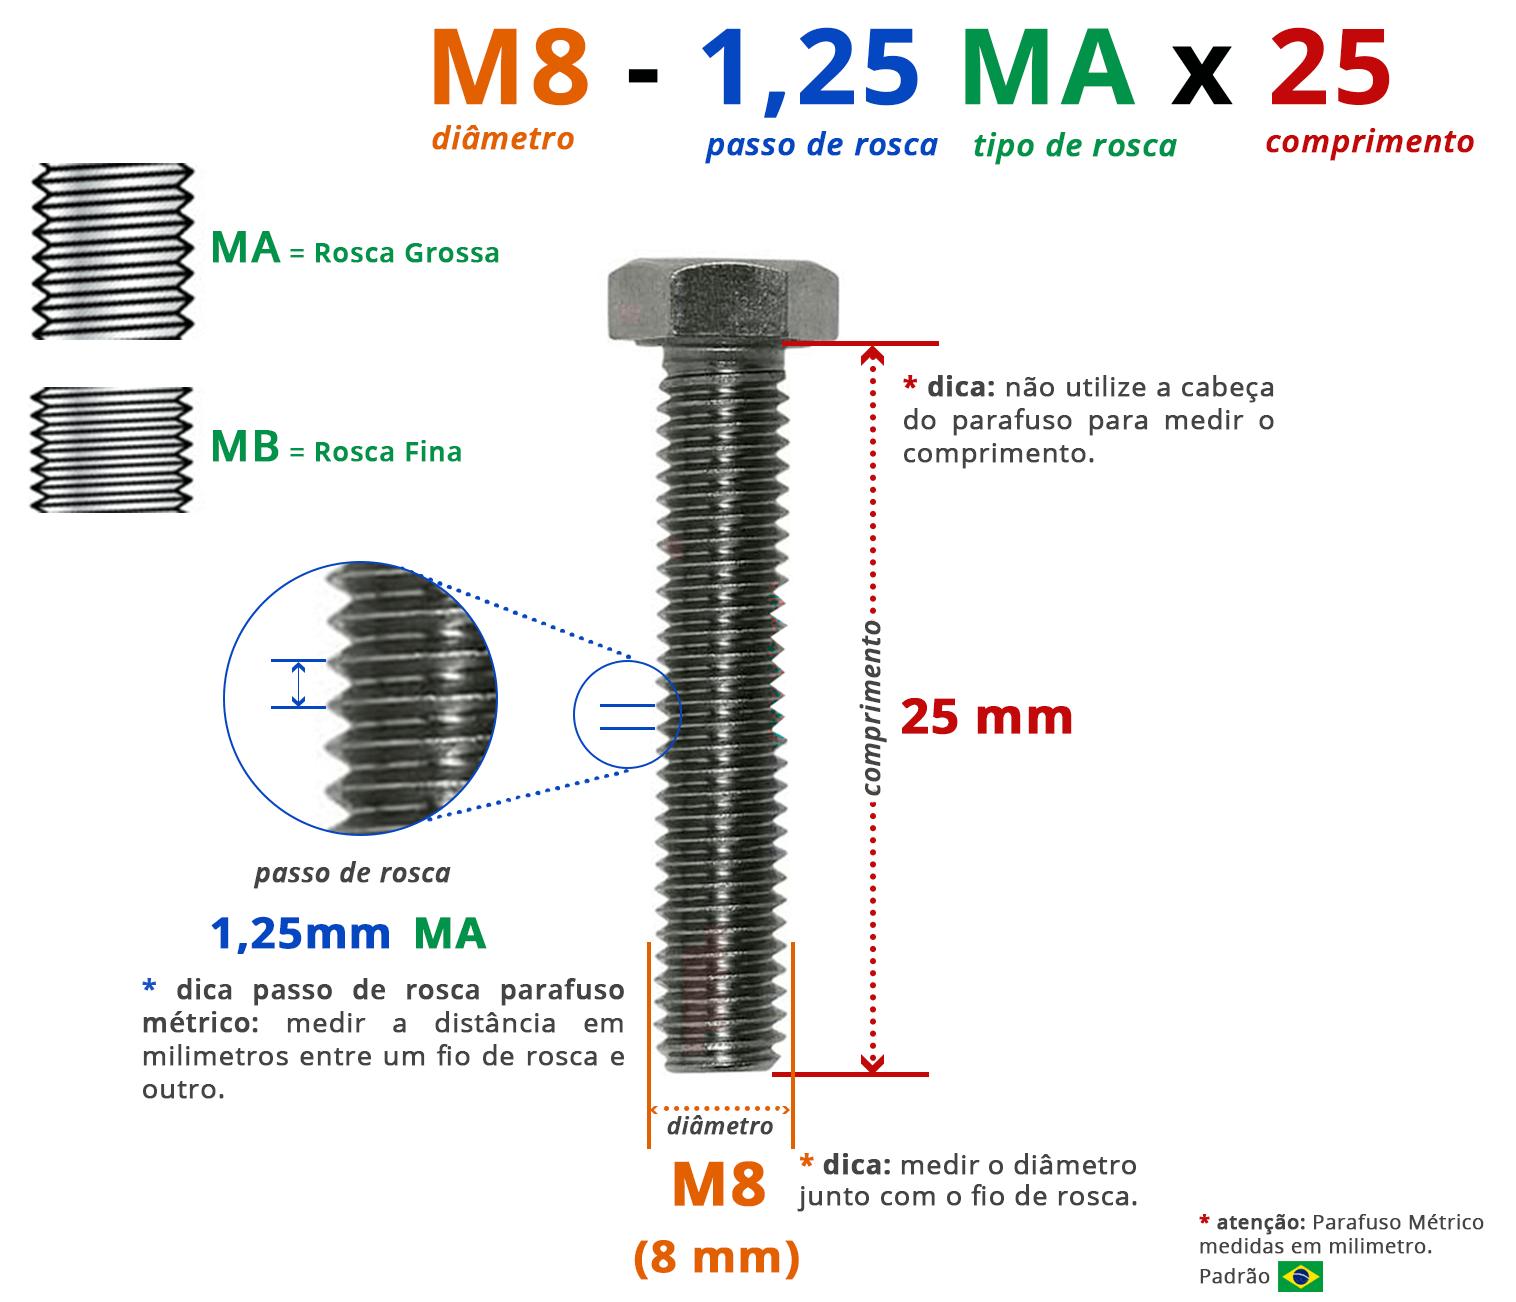 PARAFUSO SEXTAVADO ROSCA INTEIRA M8 1,25 MA X 25 DIN 933 INOX A4